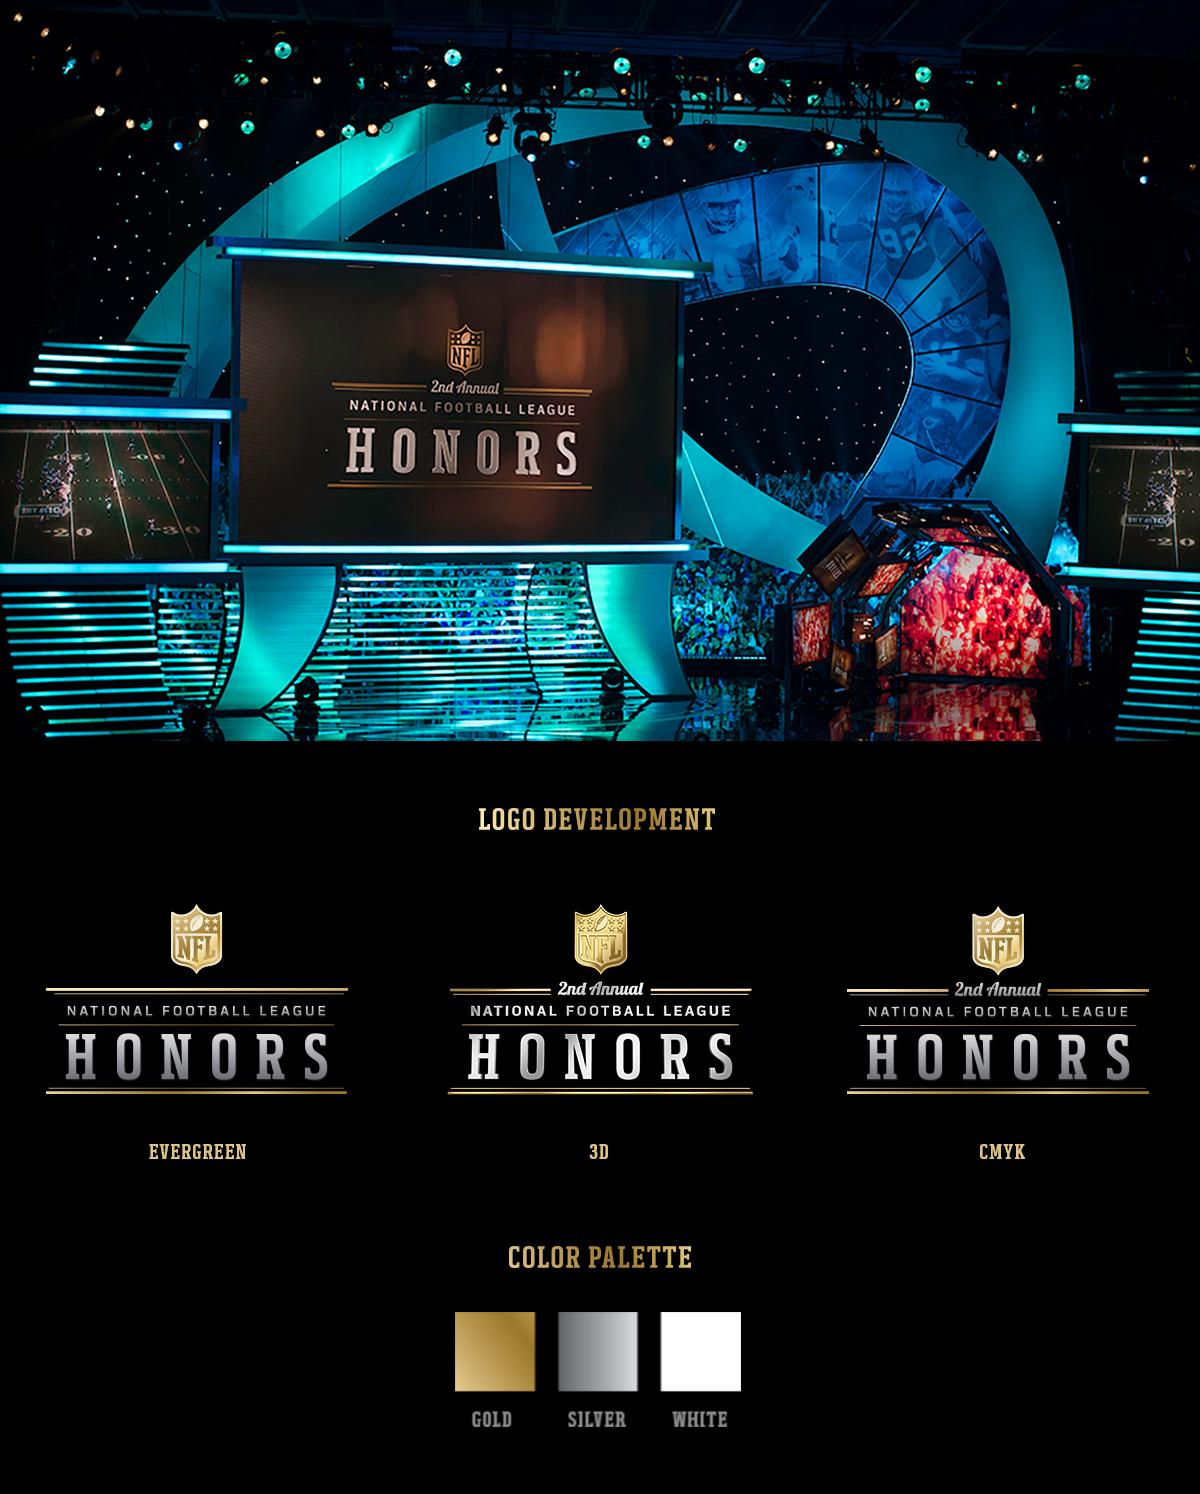 NFL_Honors_identity.jpg